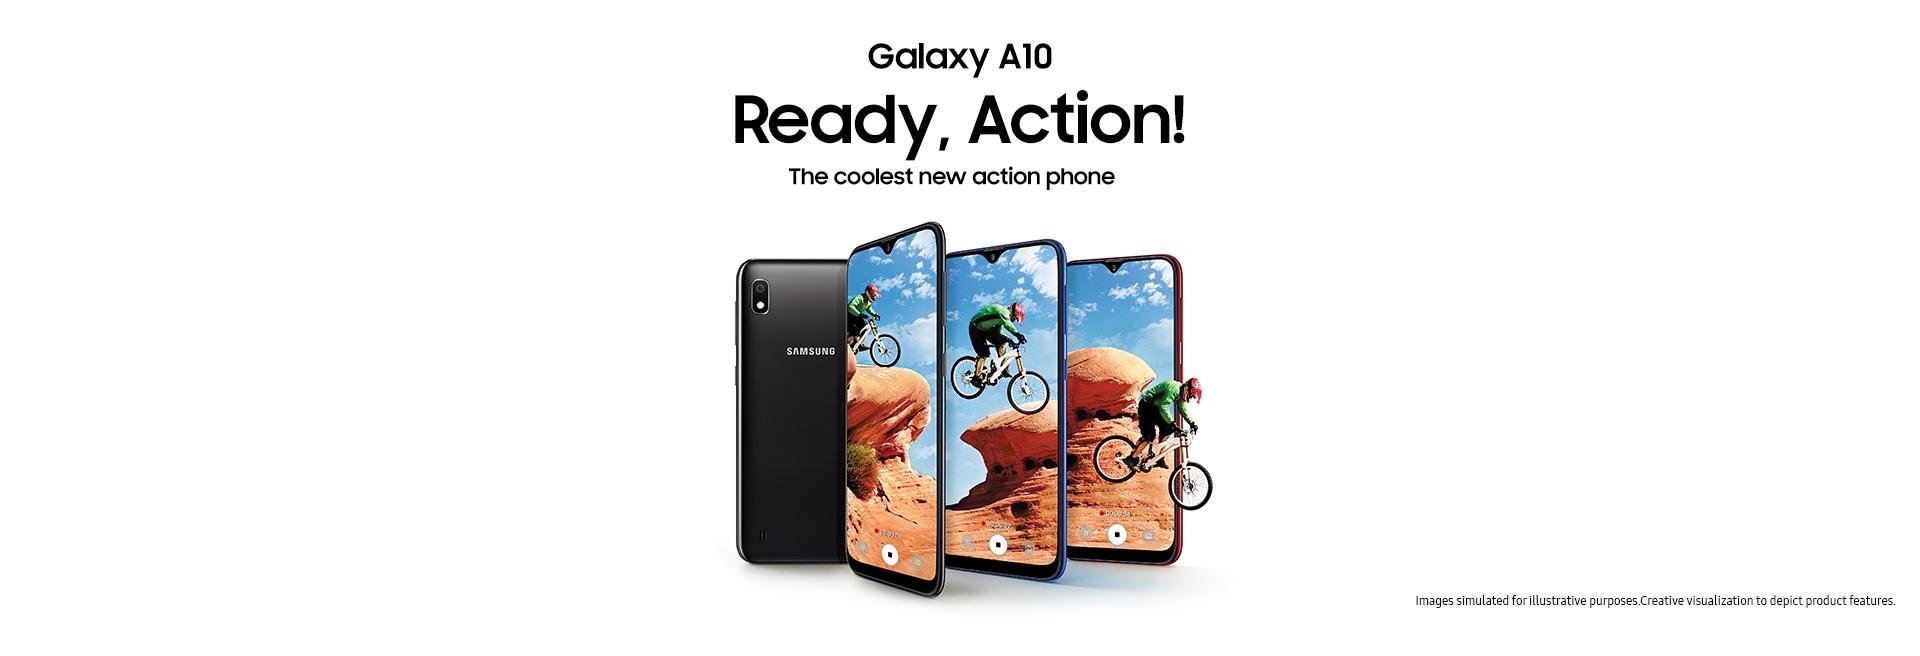 Samsung Galaxy A Series Mobiles